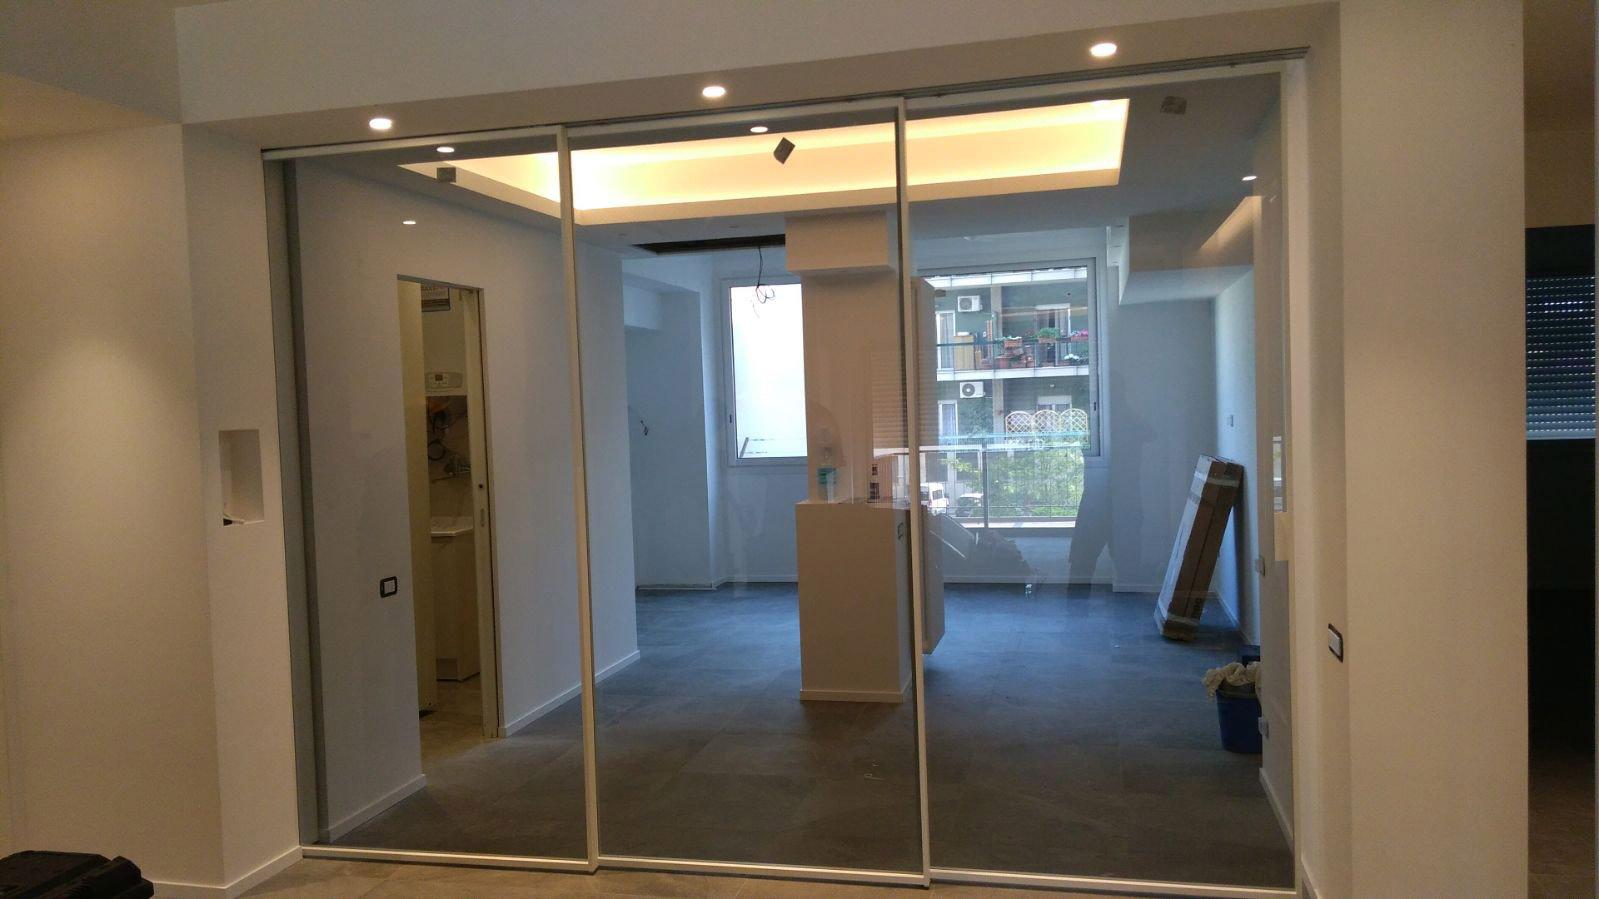 Porte vetro interni appartamento tecnoinfissi srl for Interni srl